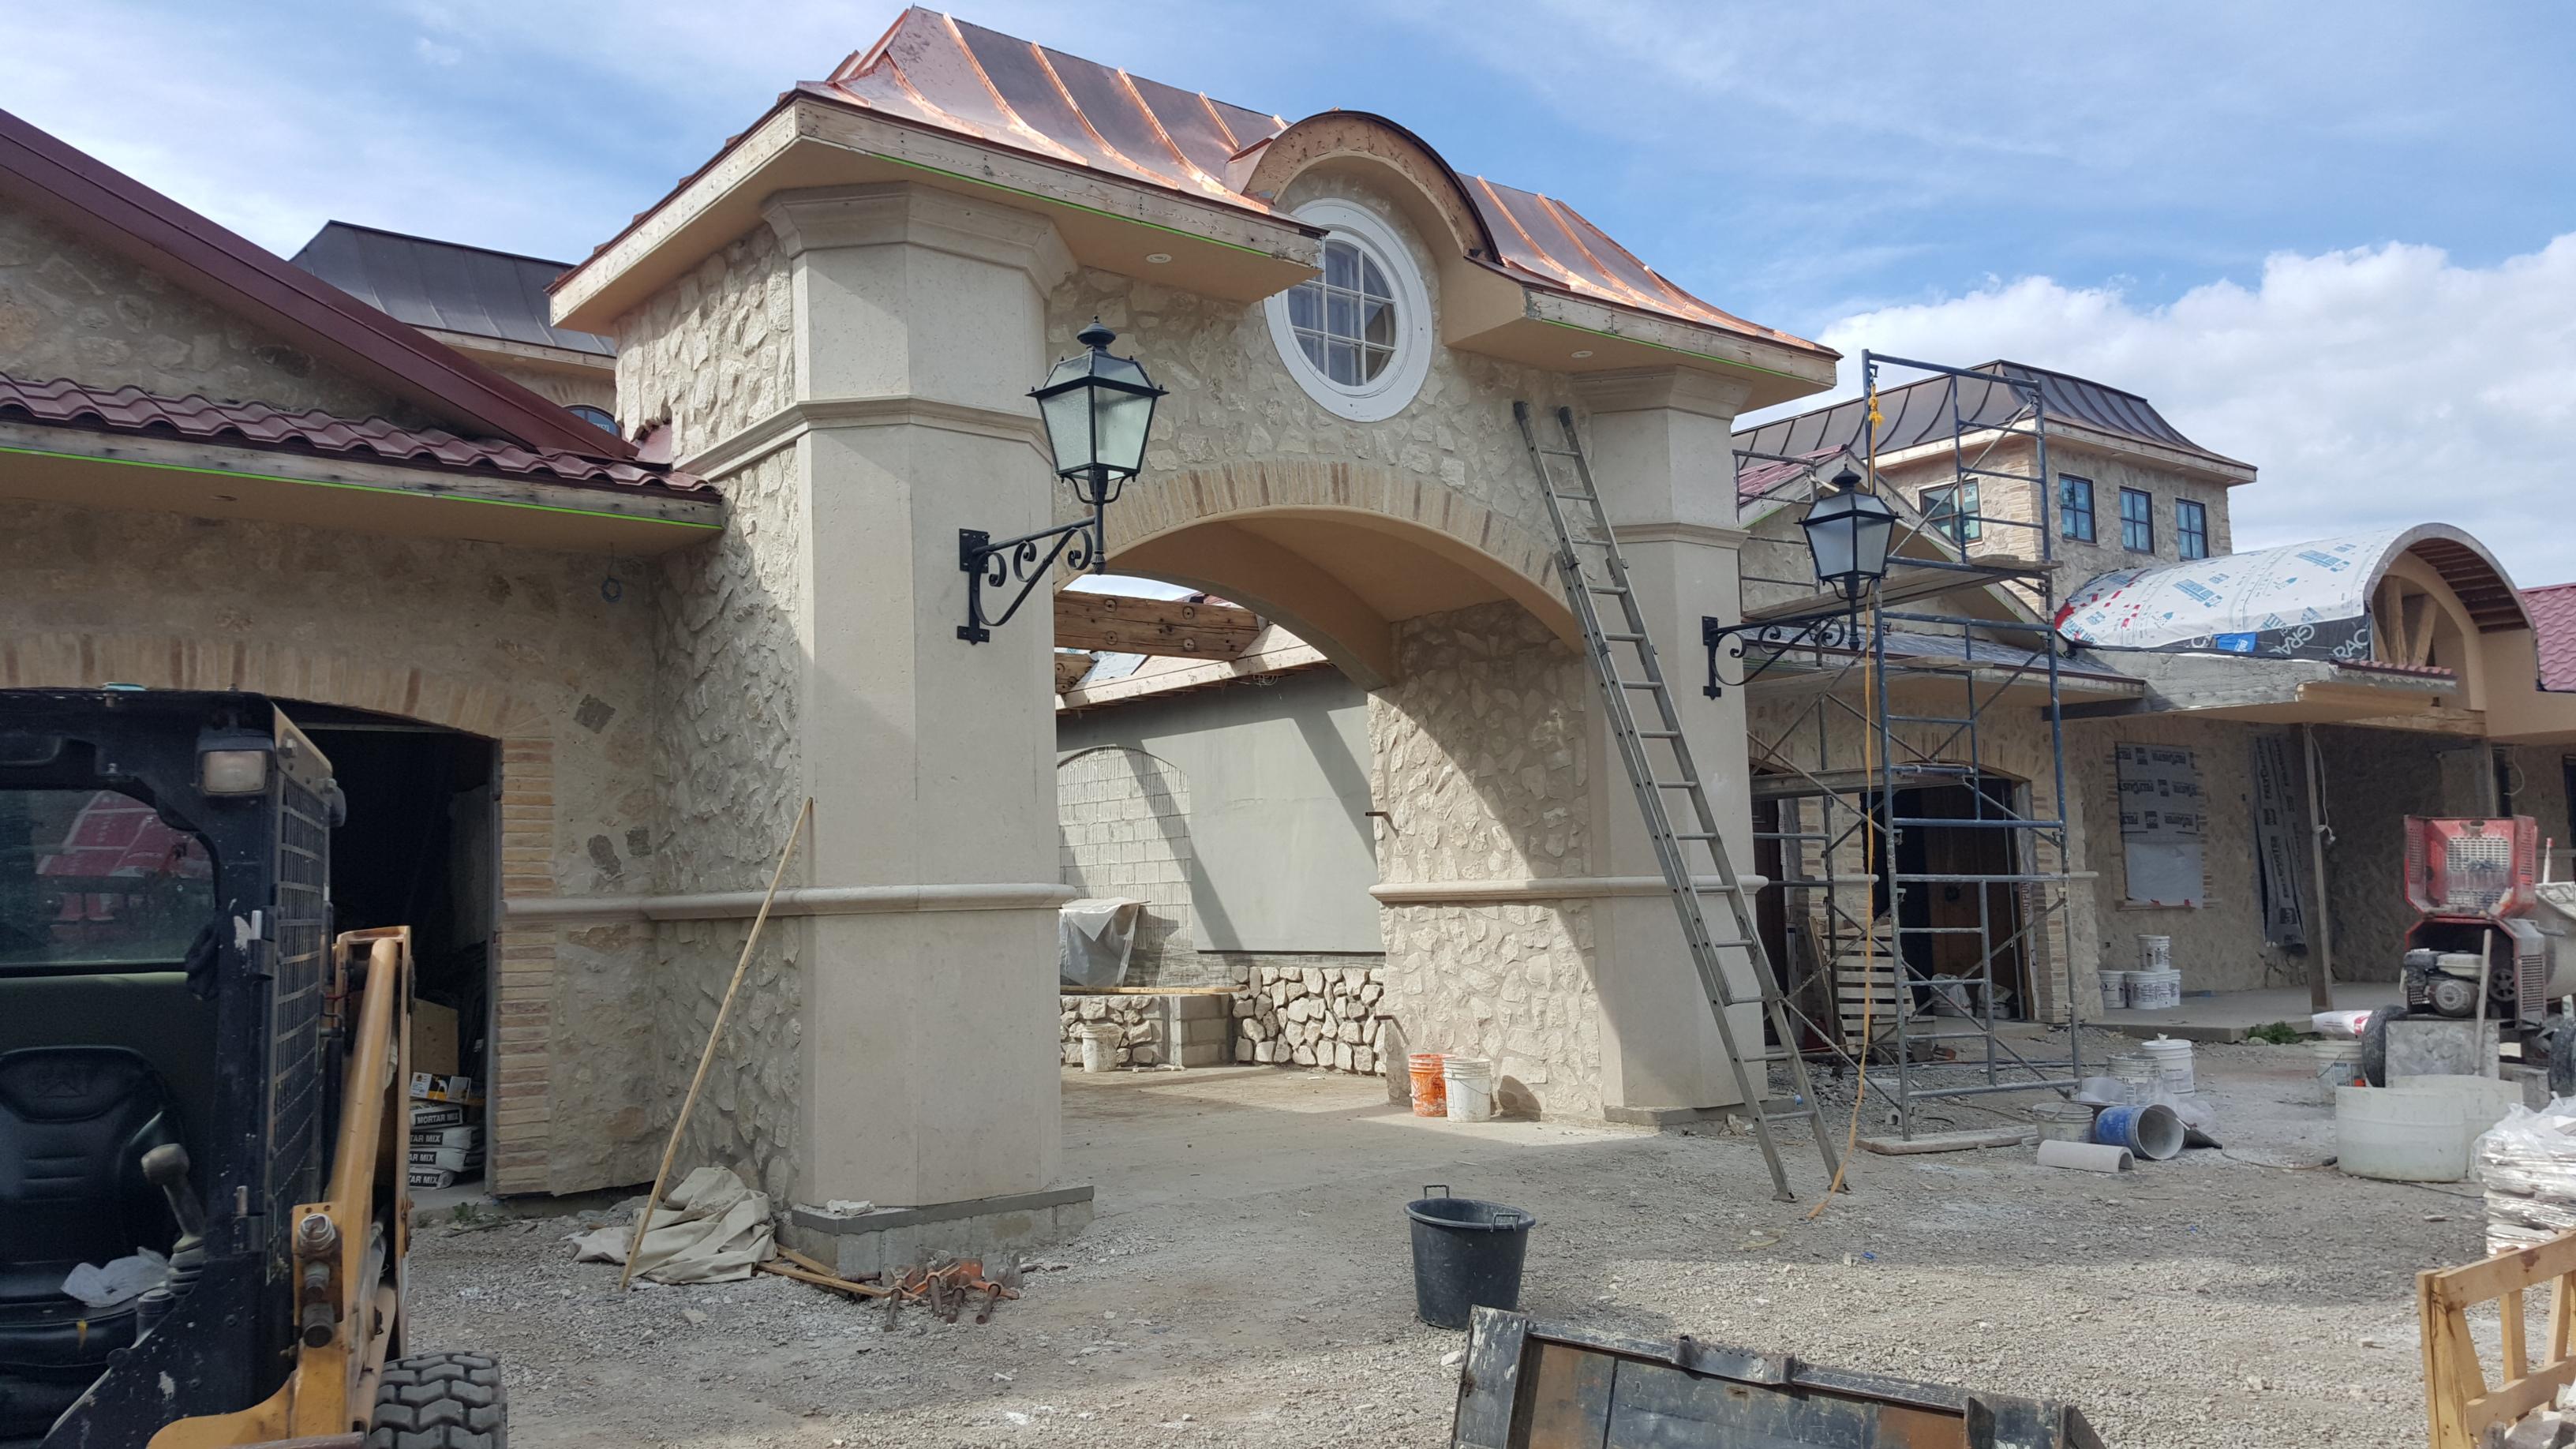 GFRC limestone cladding